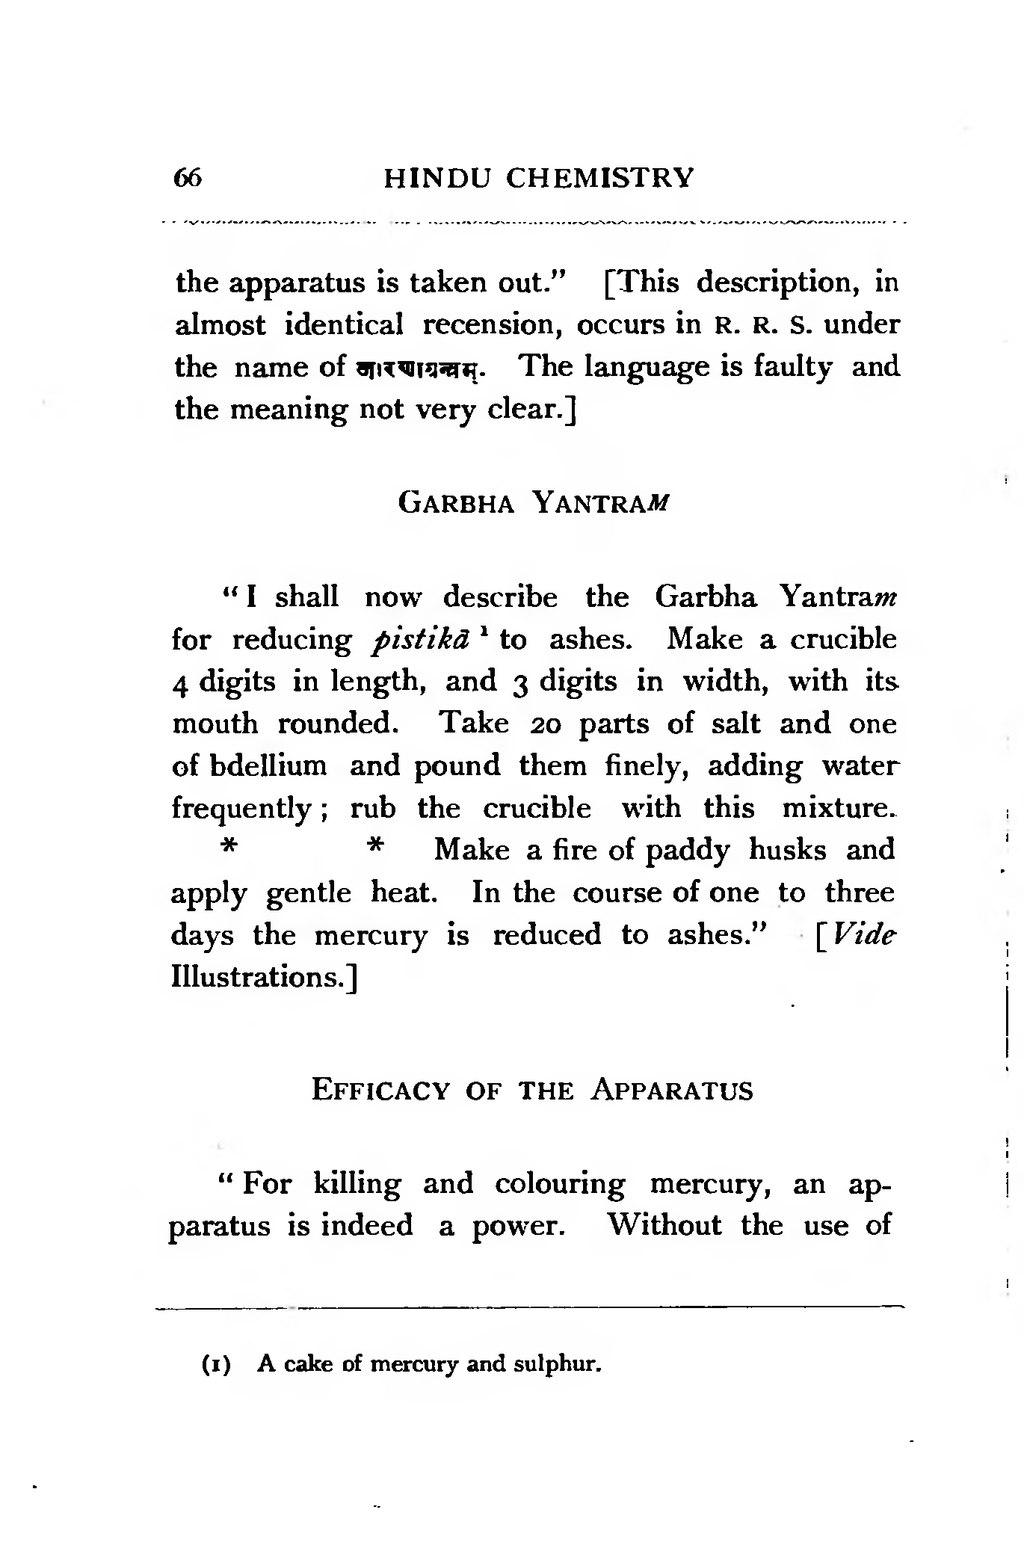 Pagea History Of Hindu Chemistry Vol 1djvu216 Wikisource The